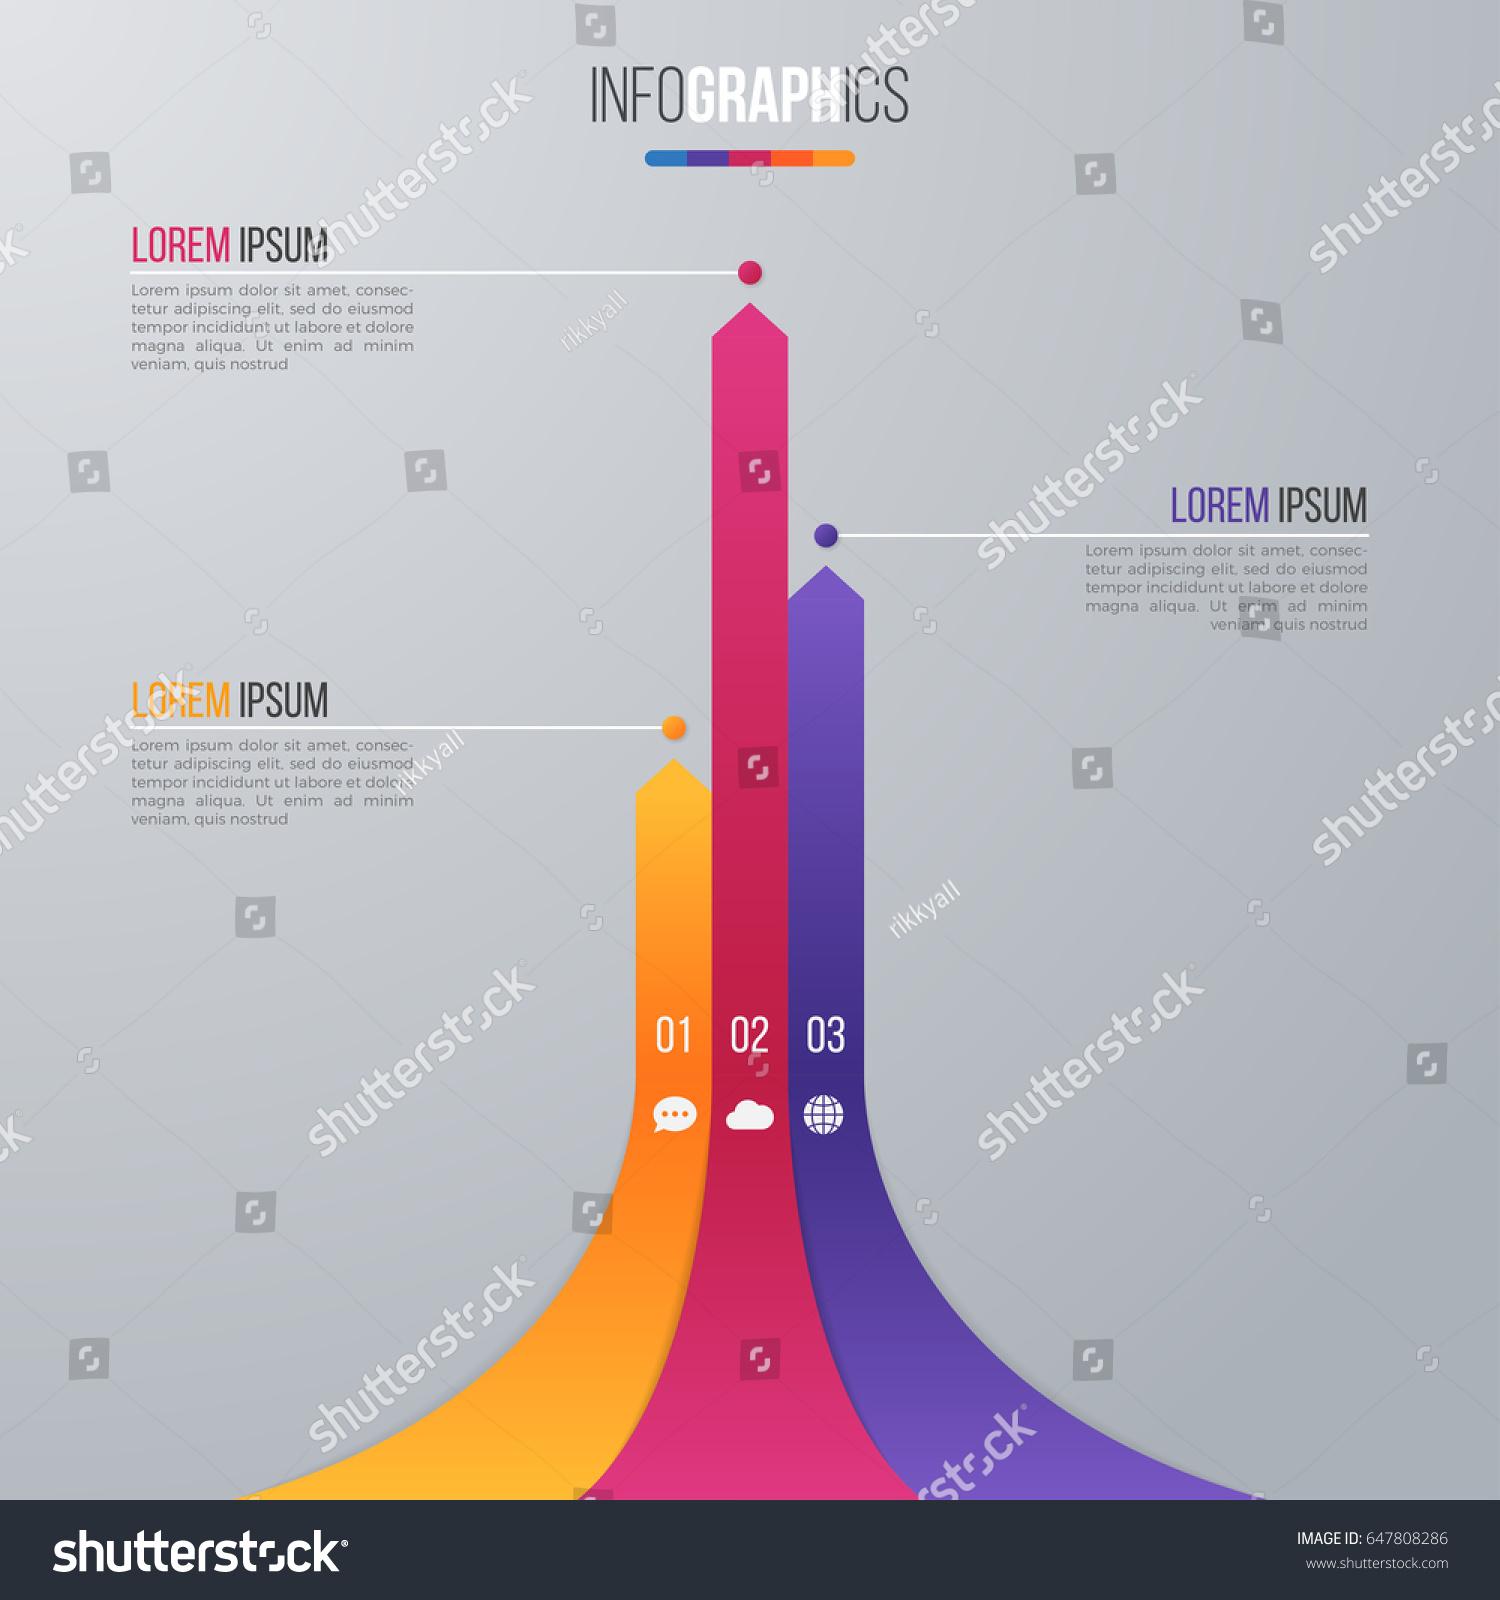 Bar Chart Infographic Template Data Visualization Stock Photo (Photo ...